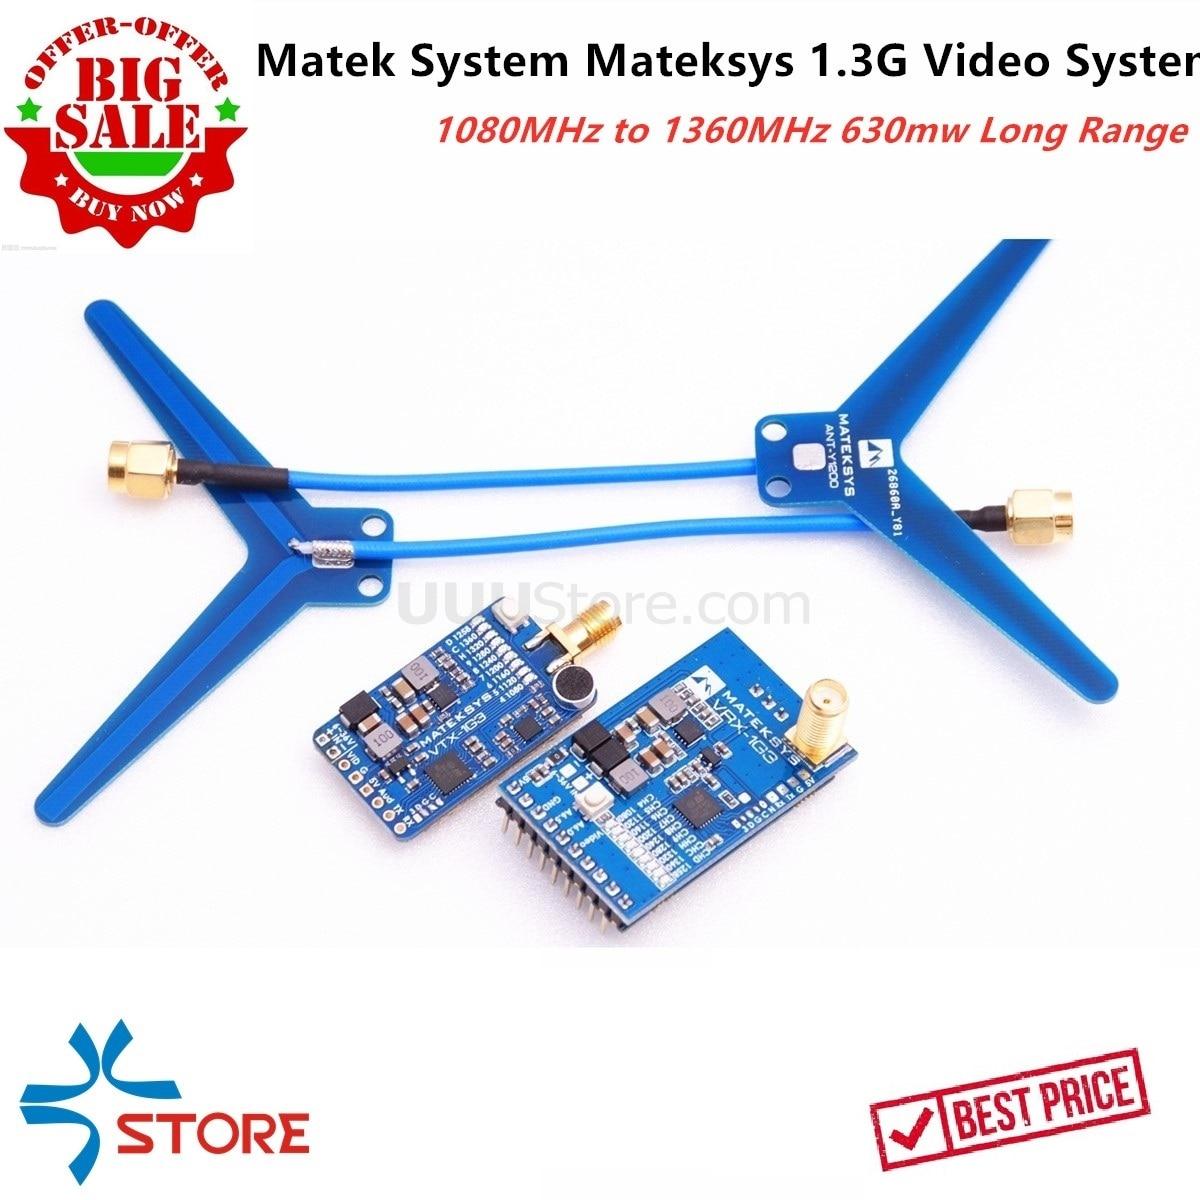 40KM de largo alcance Matek sistema Mateksys VRX-1G3 VTX-1G3 1,3 GHz FPV 2CH-9CH 630 transmisor de vídeo MW con banda de receptor de vídeo